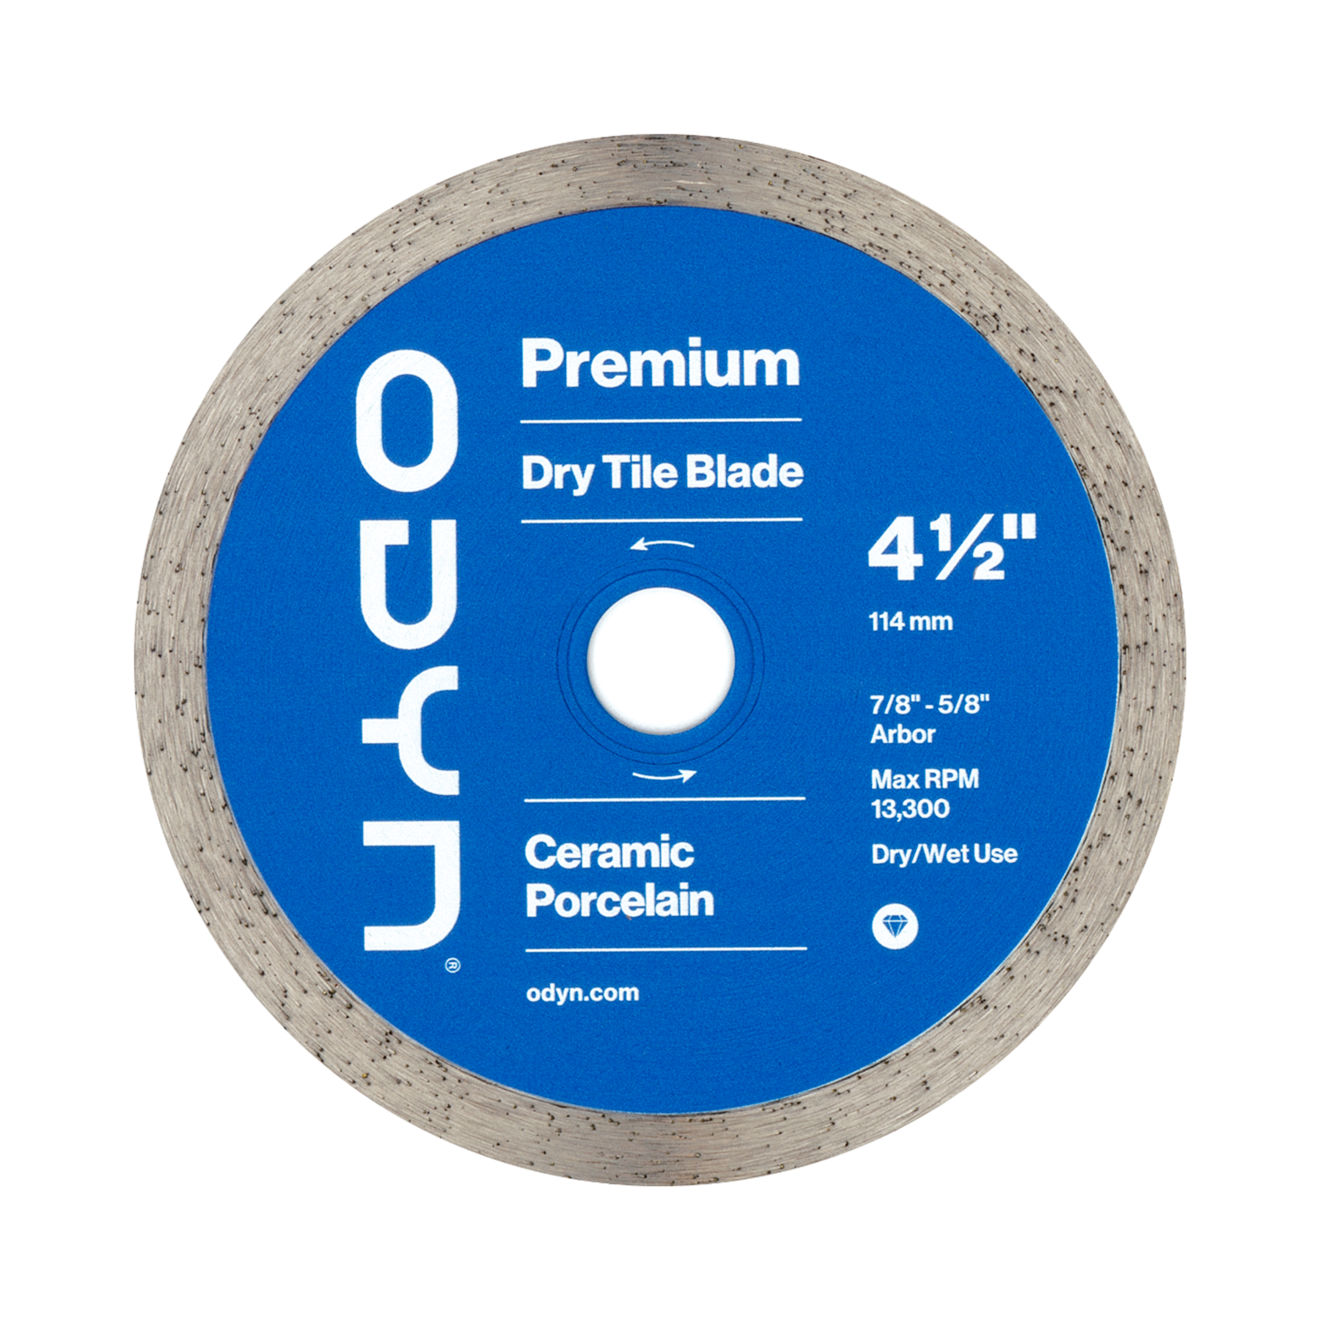 Odyn 4-1/2 in. Premium Dry Tile Blade